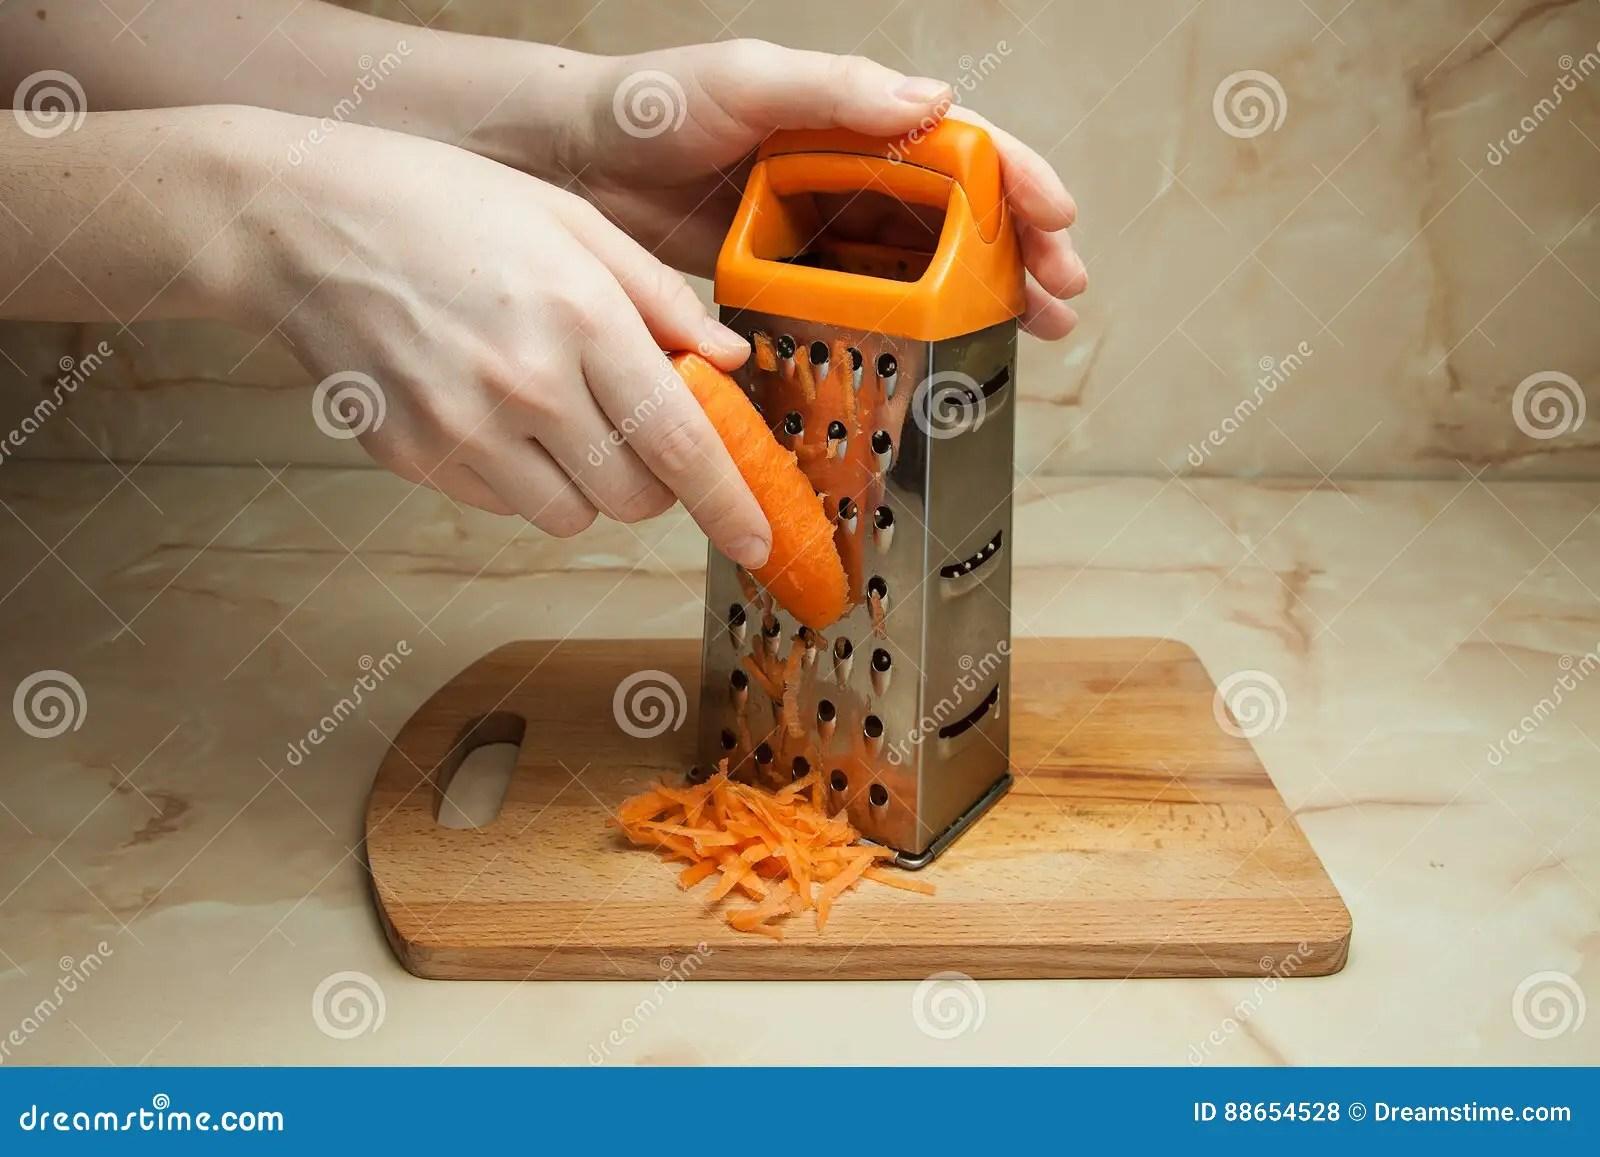 kitchen pantry portable outdoor 背景红萝卜食物磨丝器现有量藏品厨房工作室菜白色库存照片 图片包括有 背景红萝卜食物磨丝器现有量藏品厨房工作室菜白色